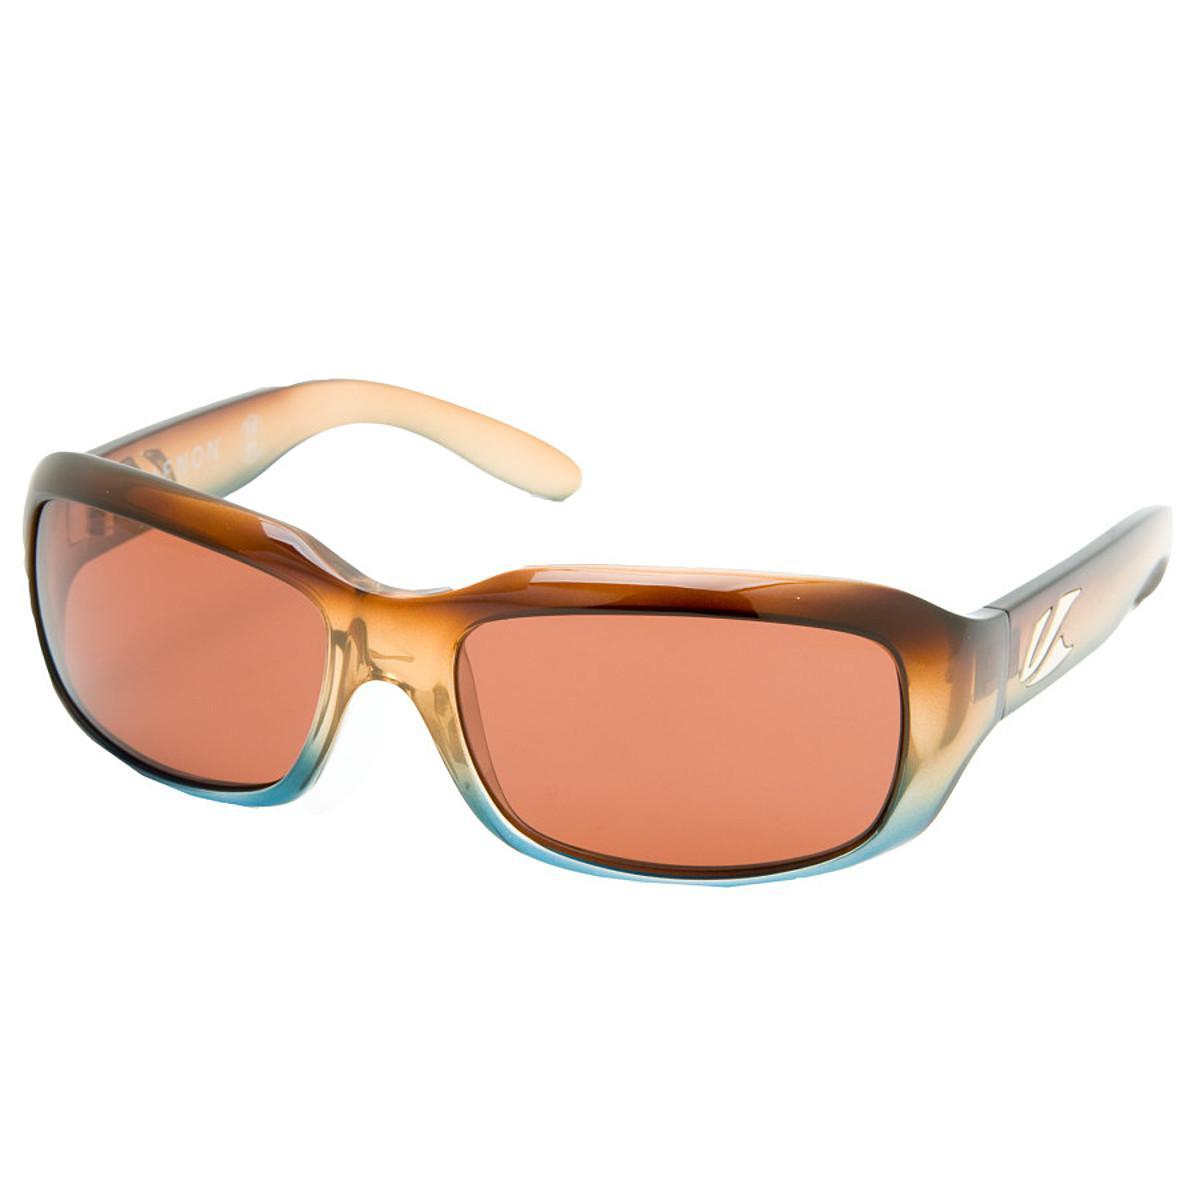 582830fb67 Lyst - Kaenon Bolsa Sunglasses - Polarized